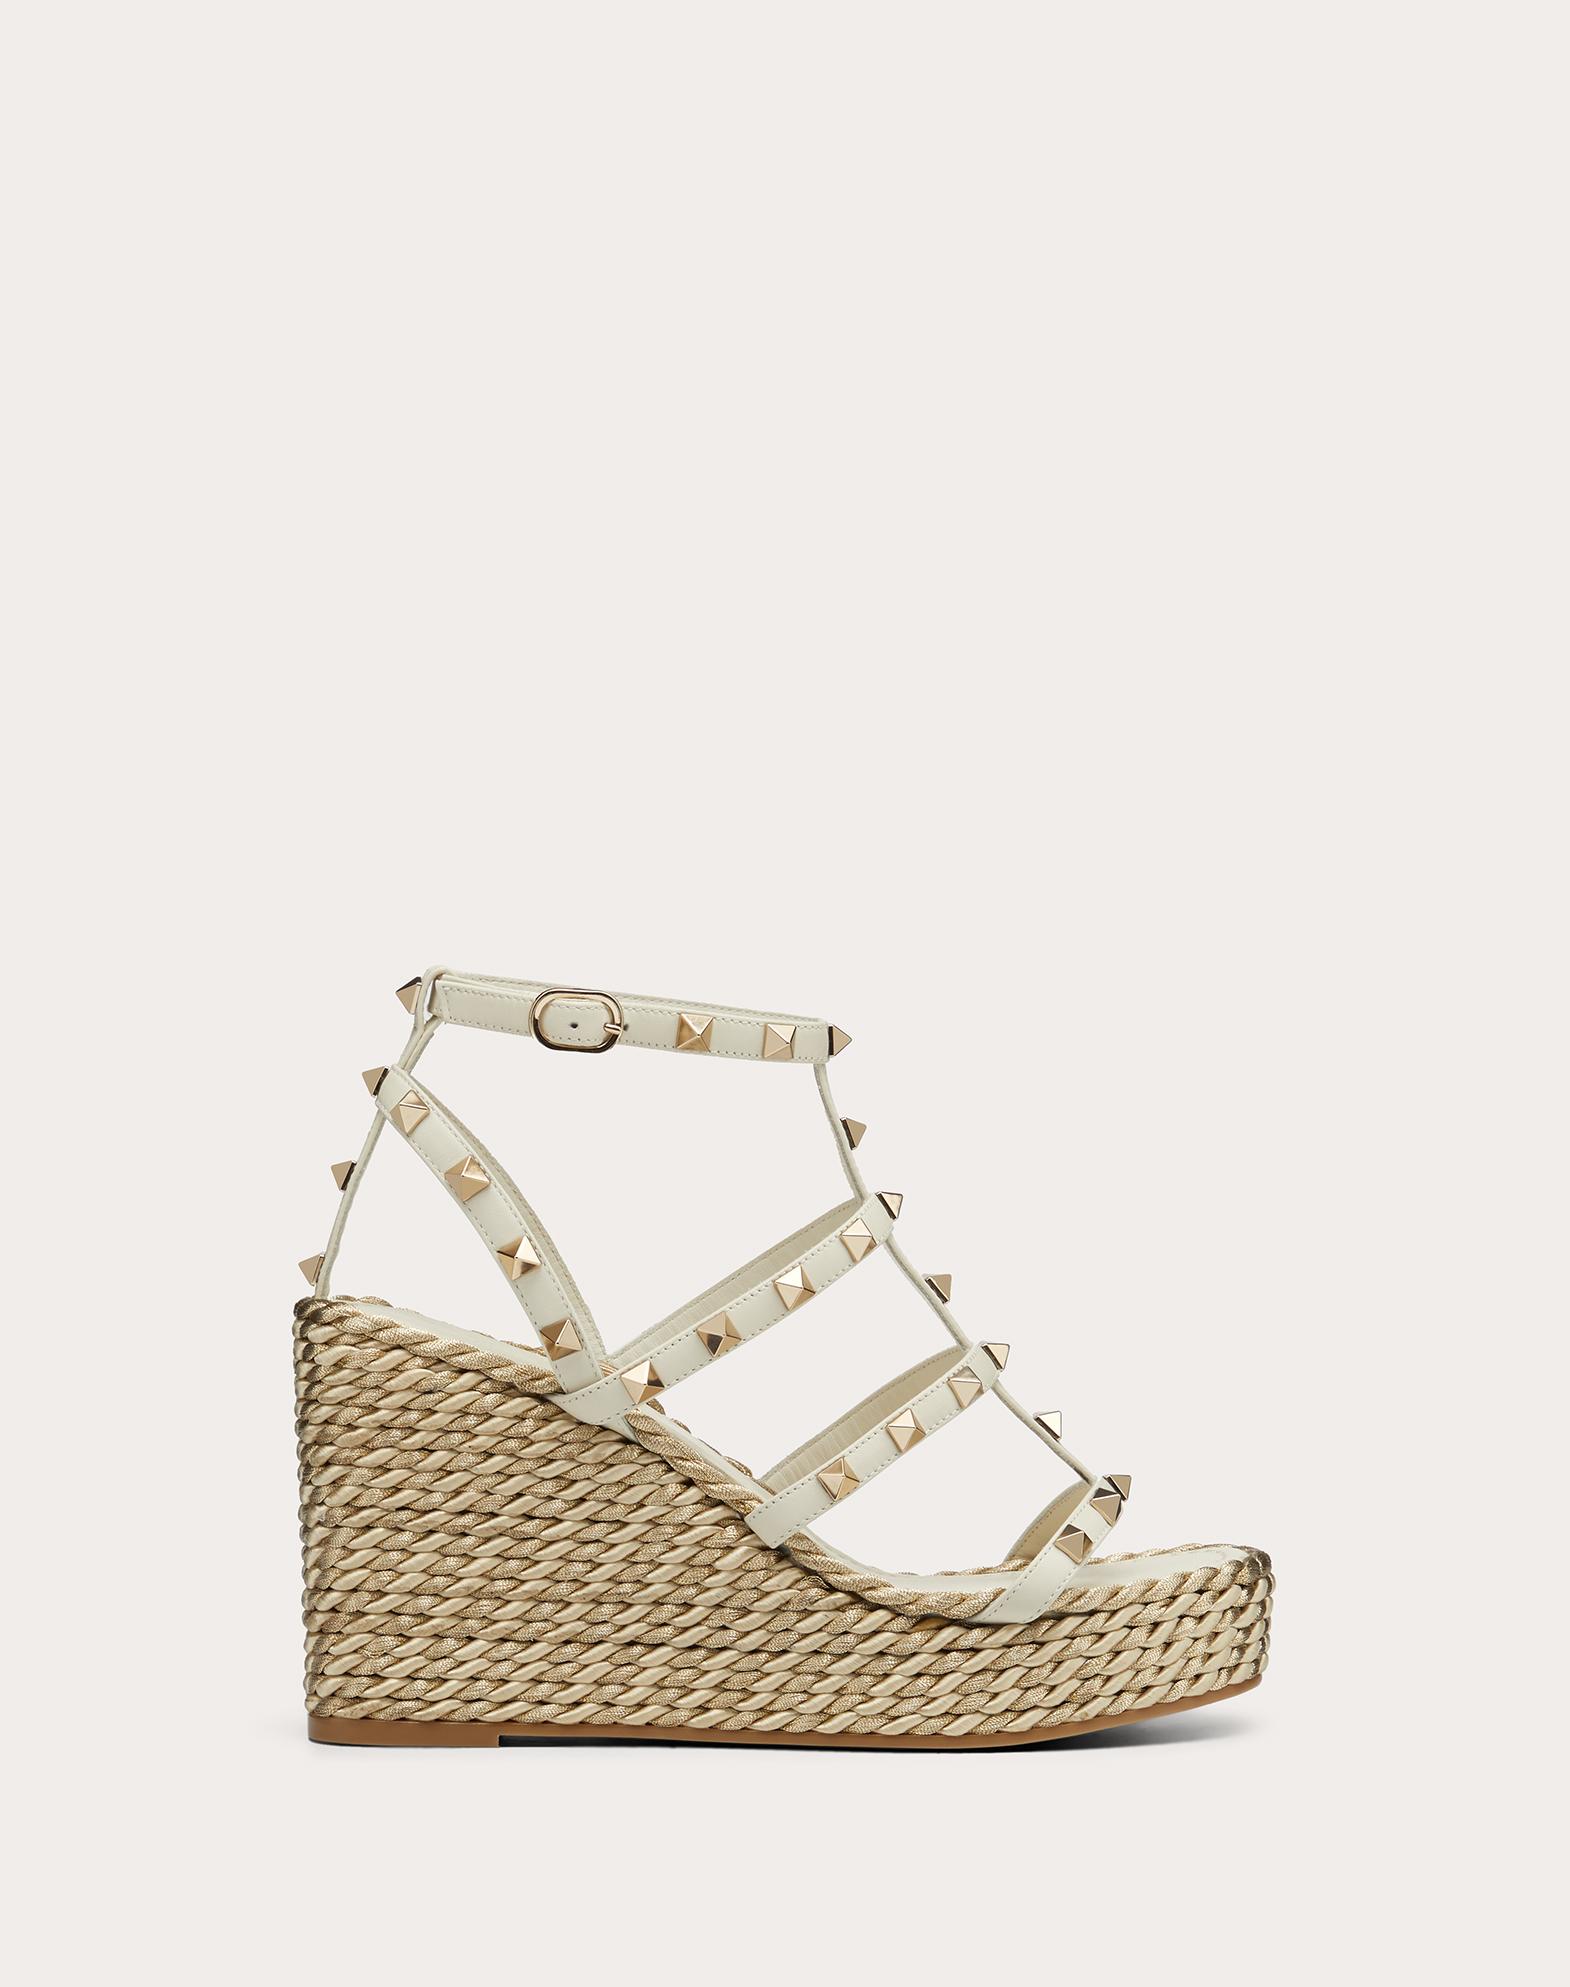 Rockstud Calfskin Wedge Sandal with Straps 95 mm